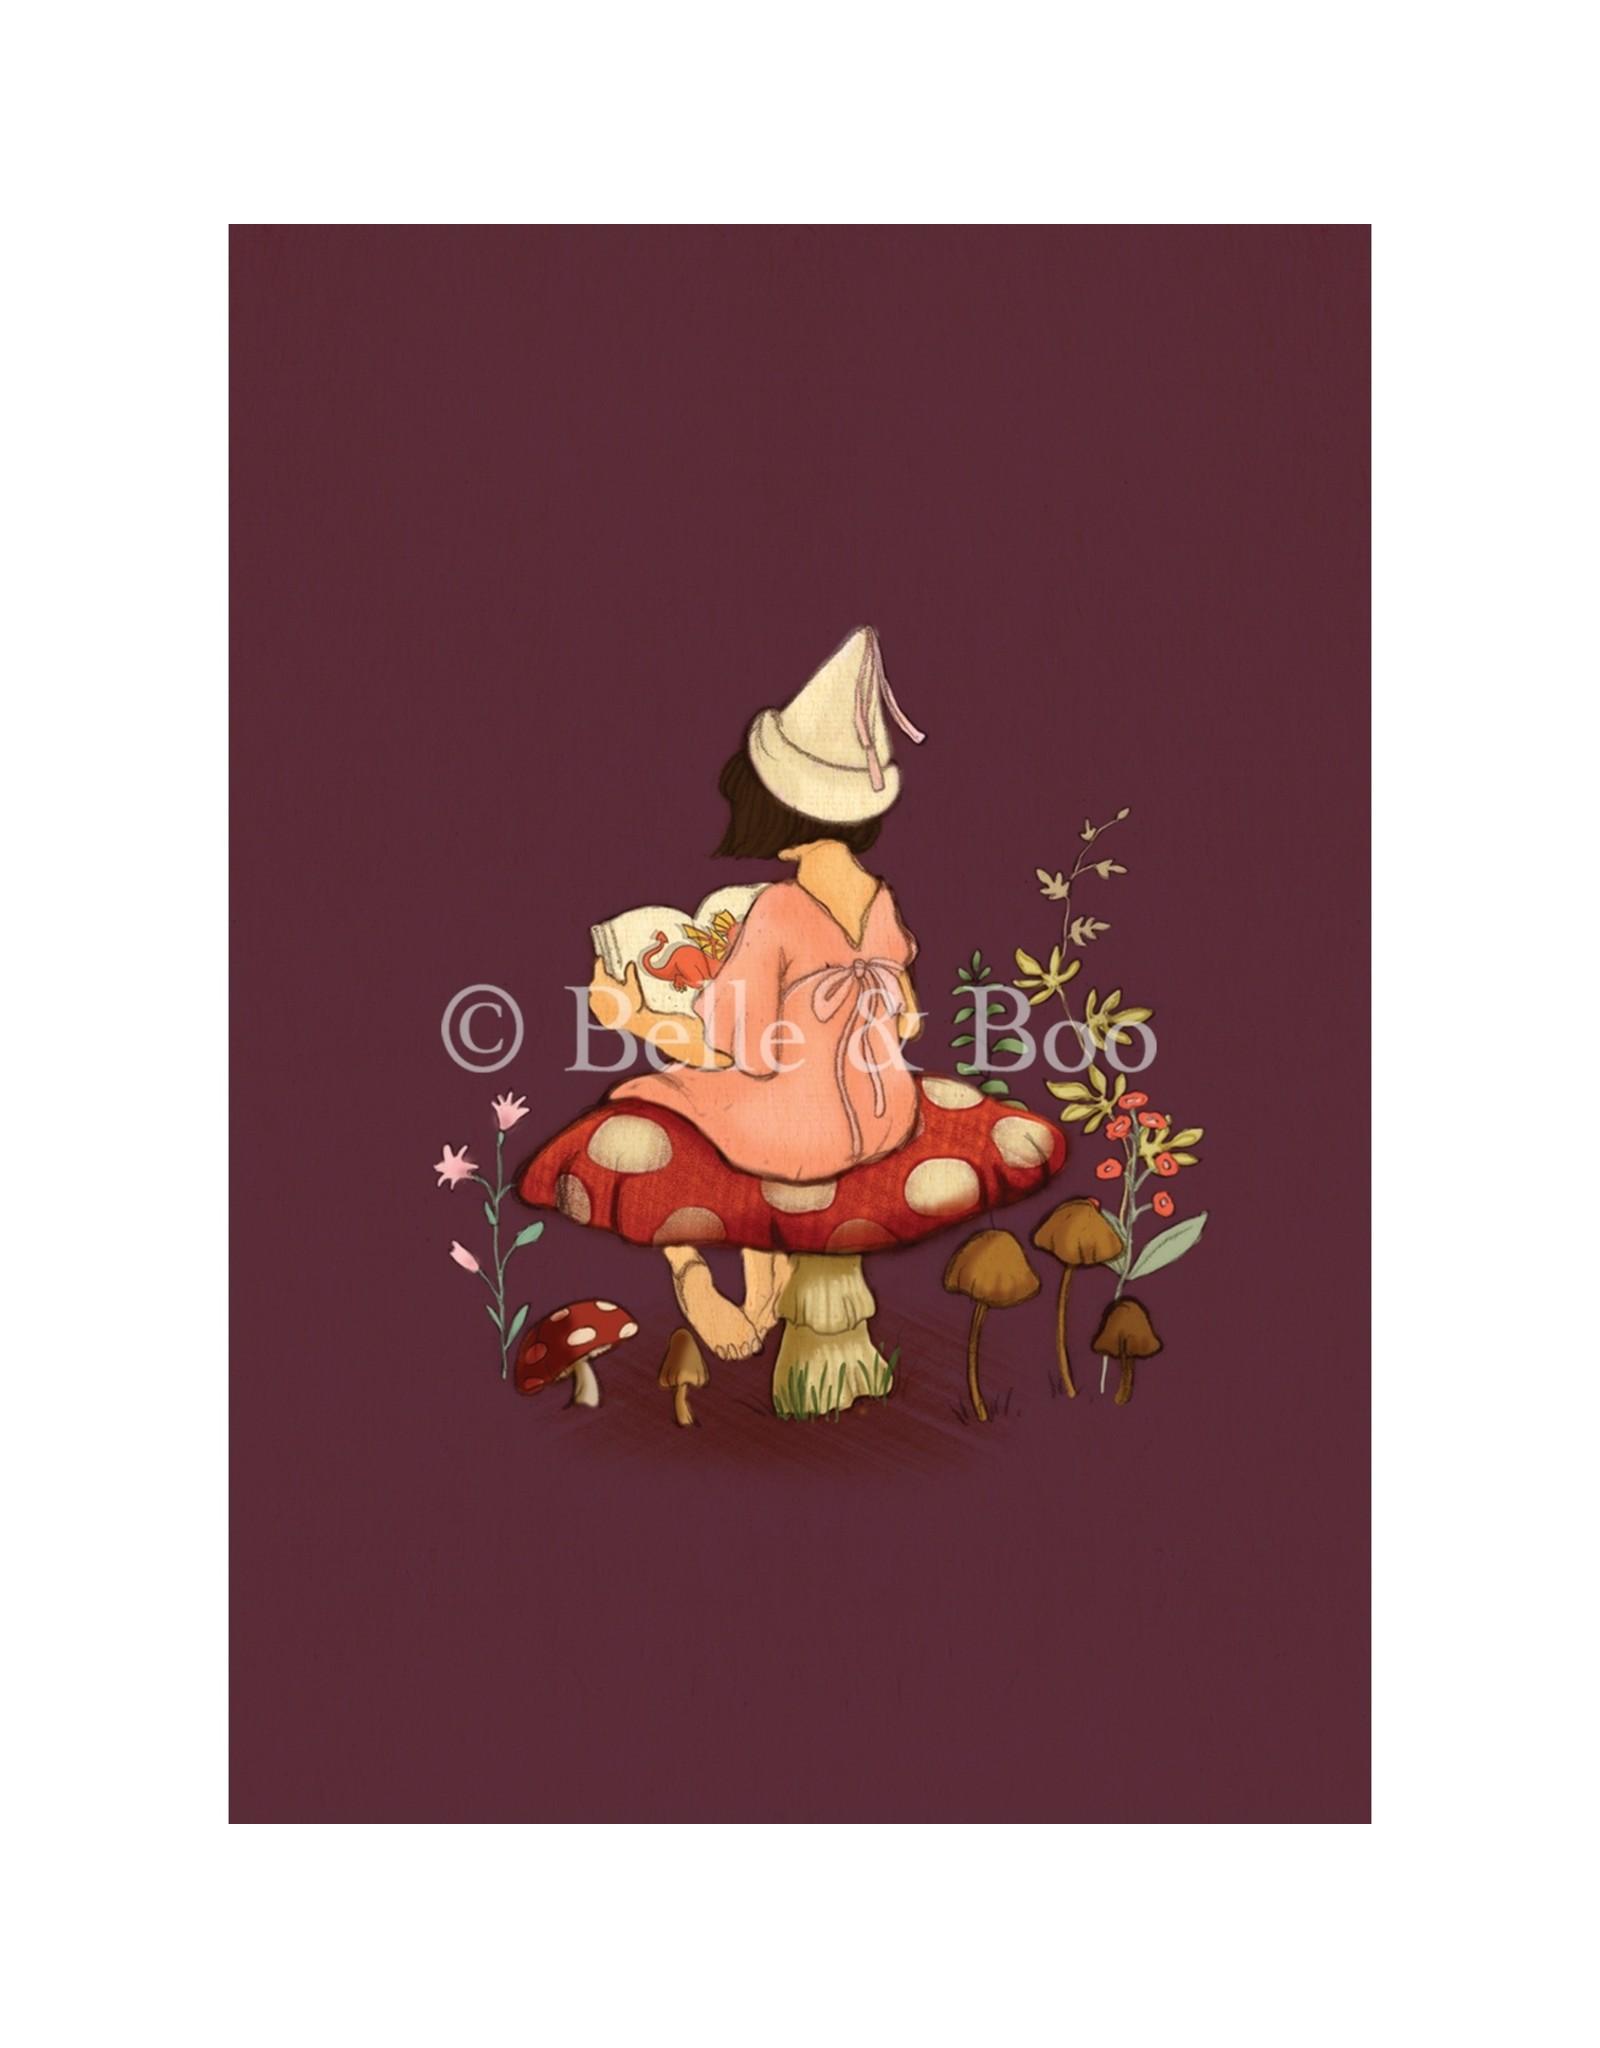 Belle & Boo card - toadstool tales